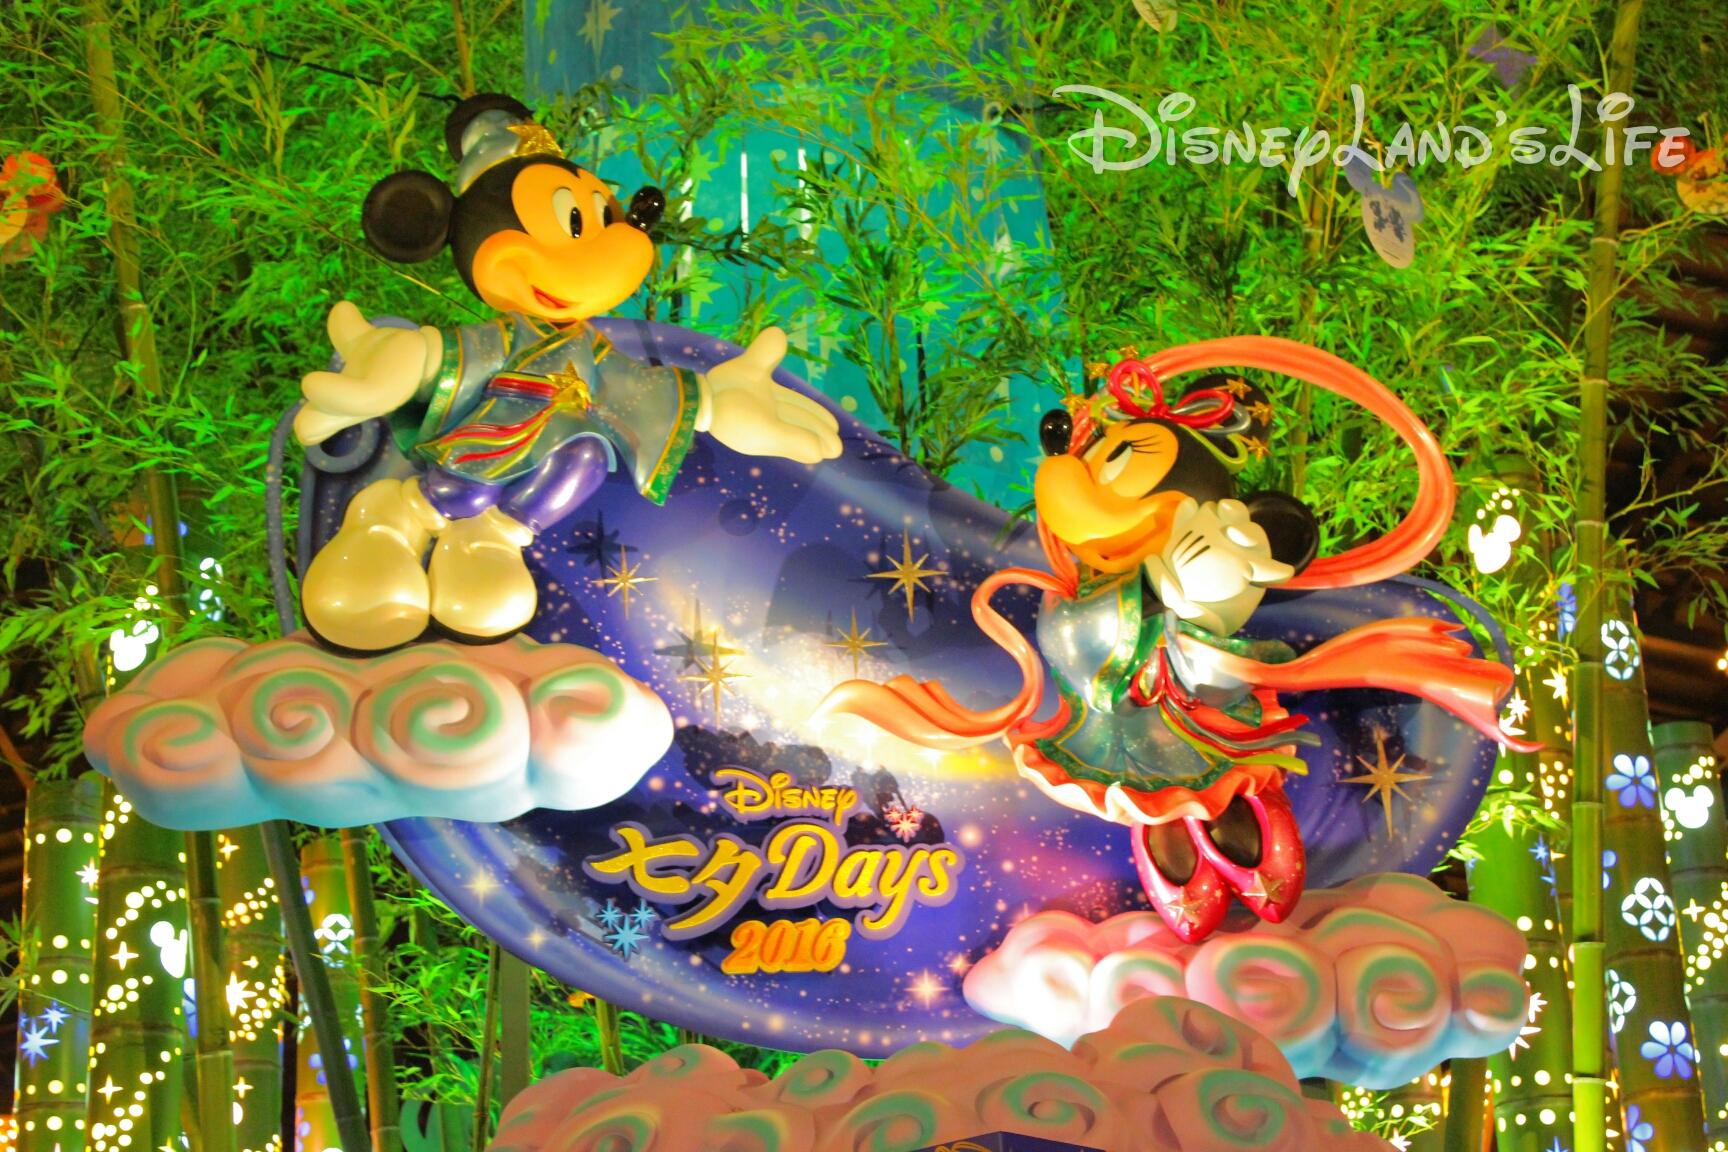 tanabata16_012.jpg